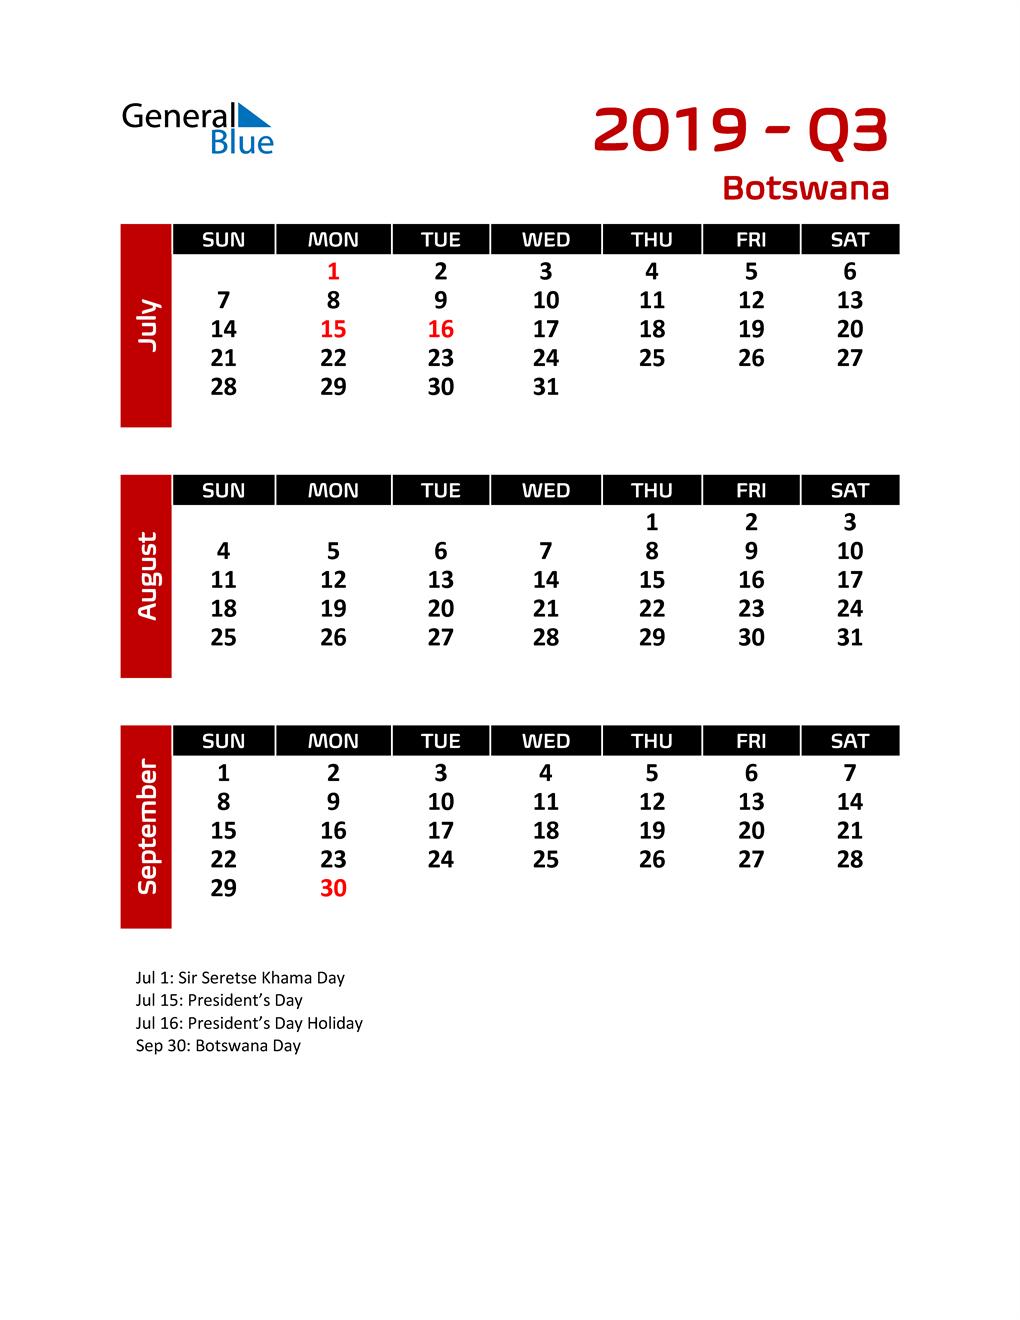 Q3 2019 Calendar with Holidays